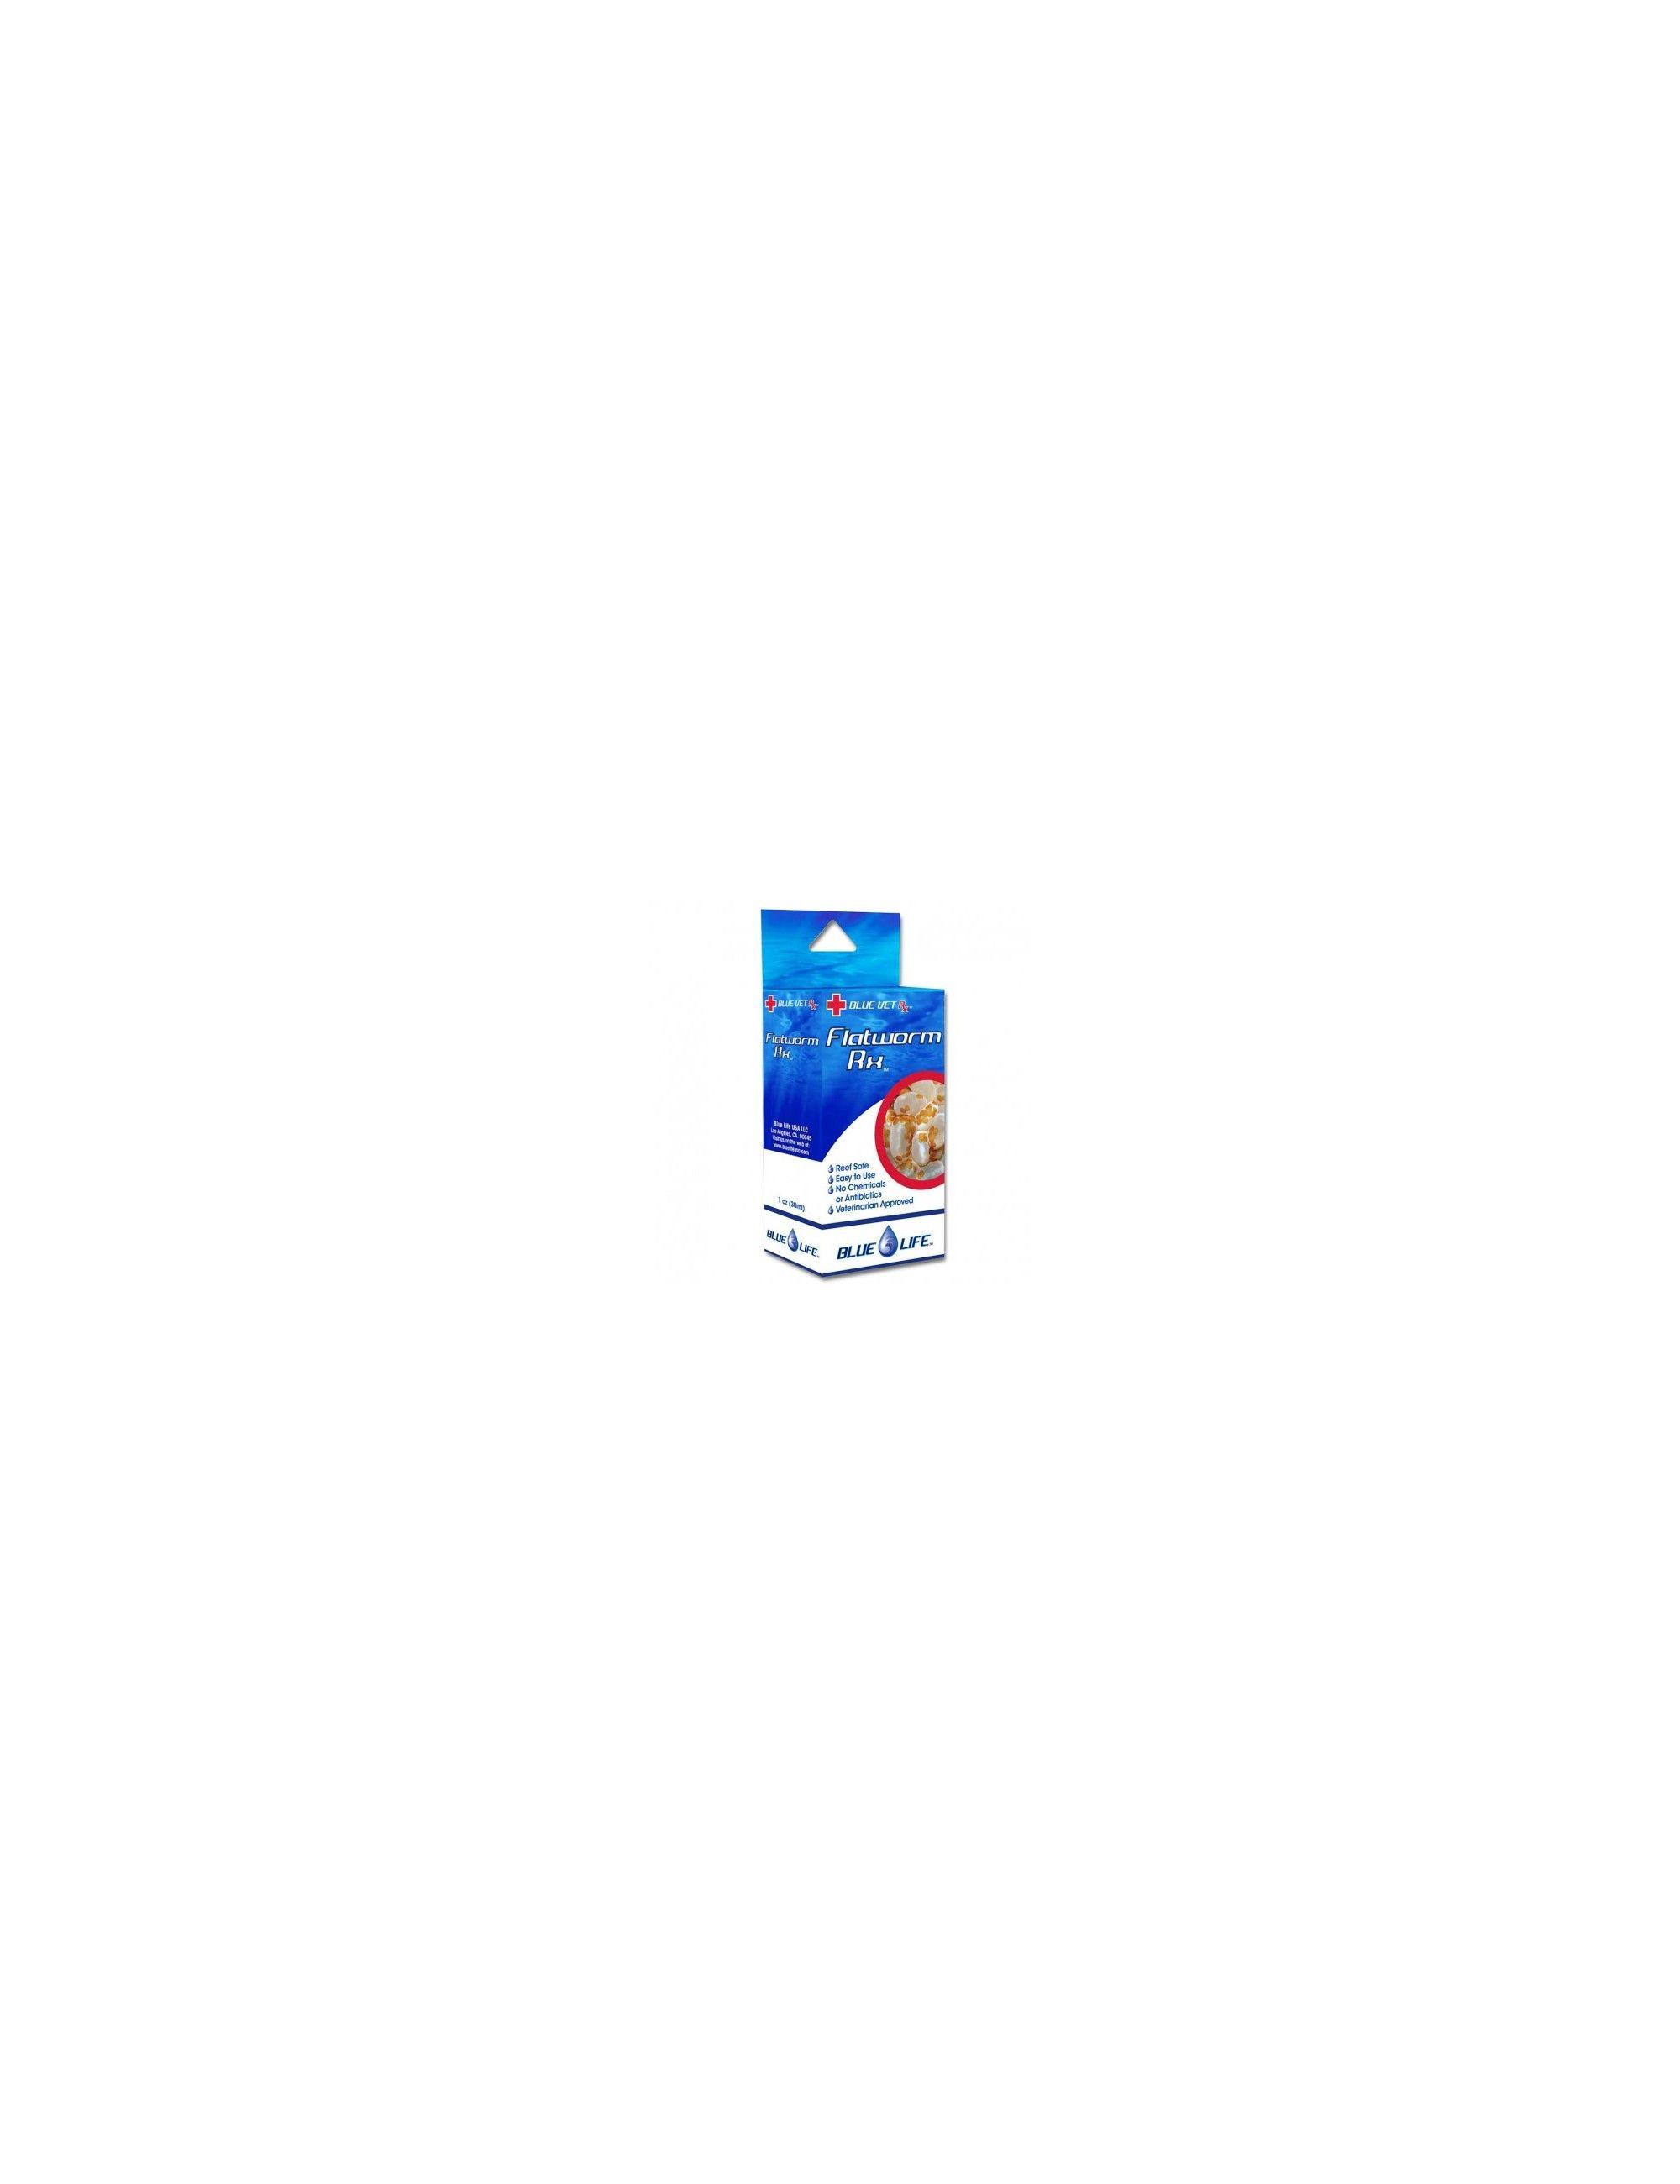 BLUE LIFE USA - Flatworm RX 30 ml - Anti vers plats